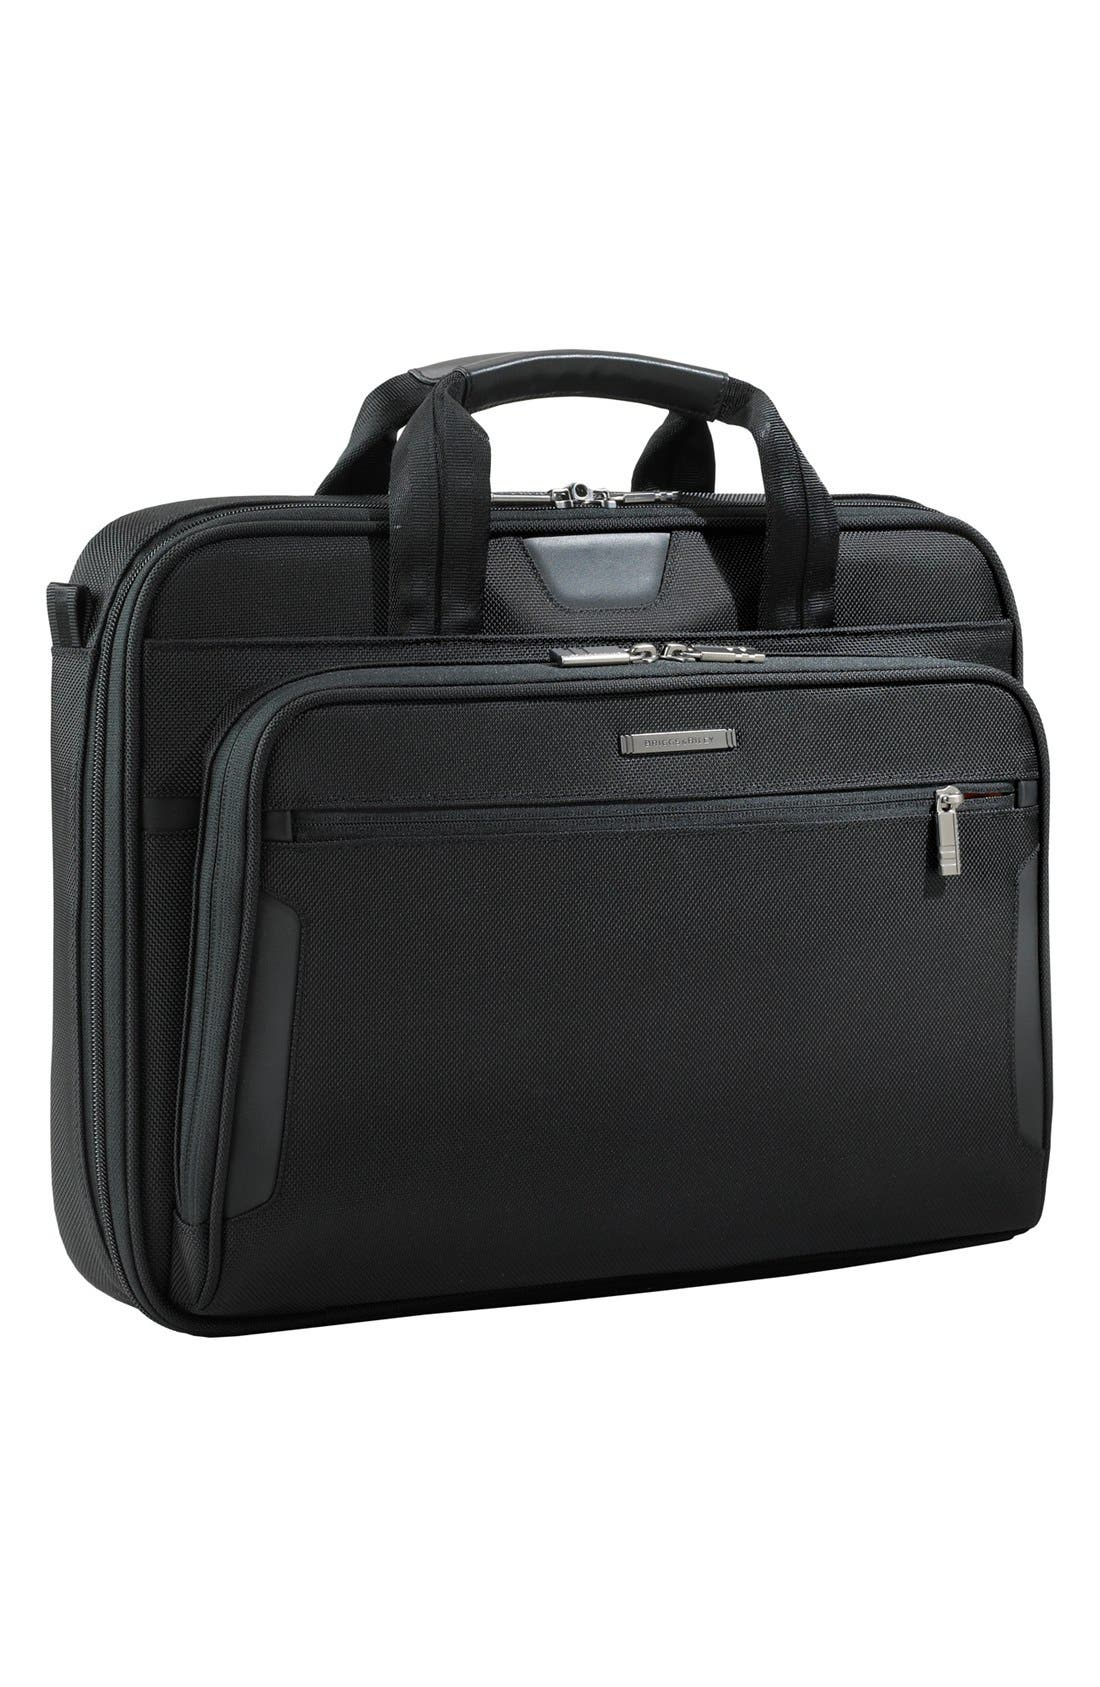 Alternate Image 1 Selected - Briggs & Riley 'Medium Slim' Ballistic Nylon Briefcase